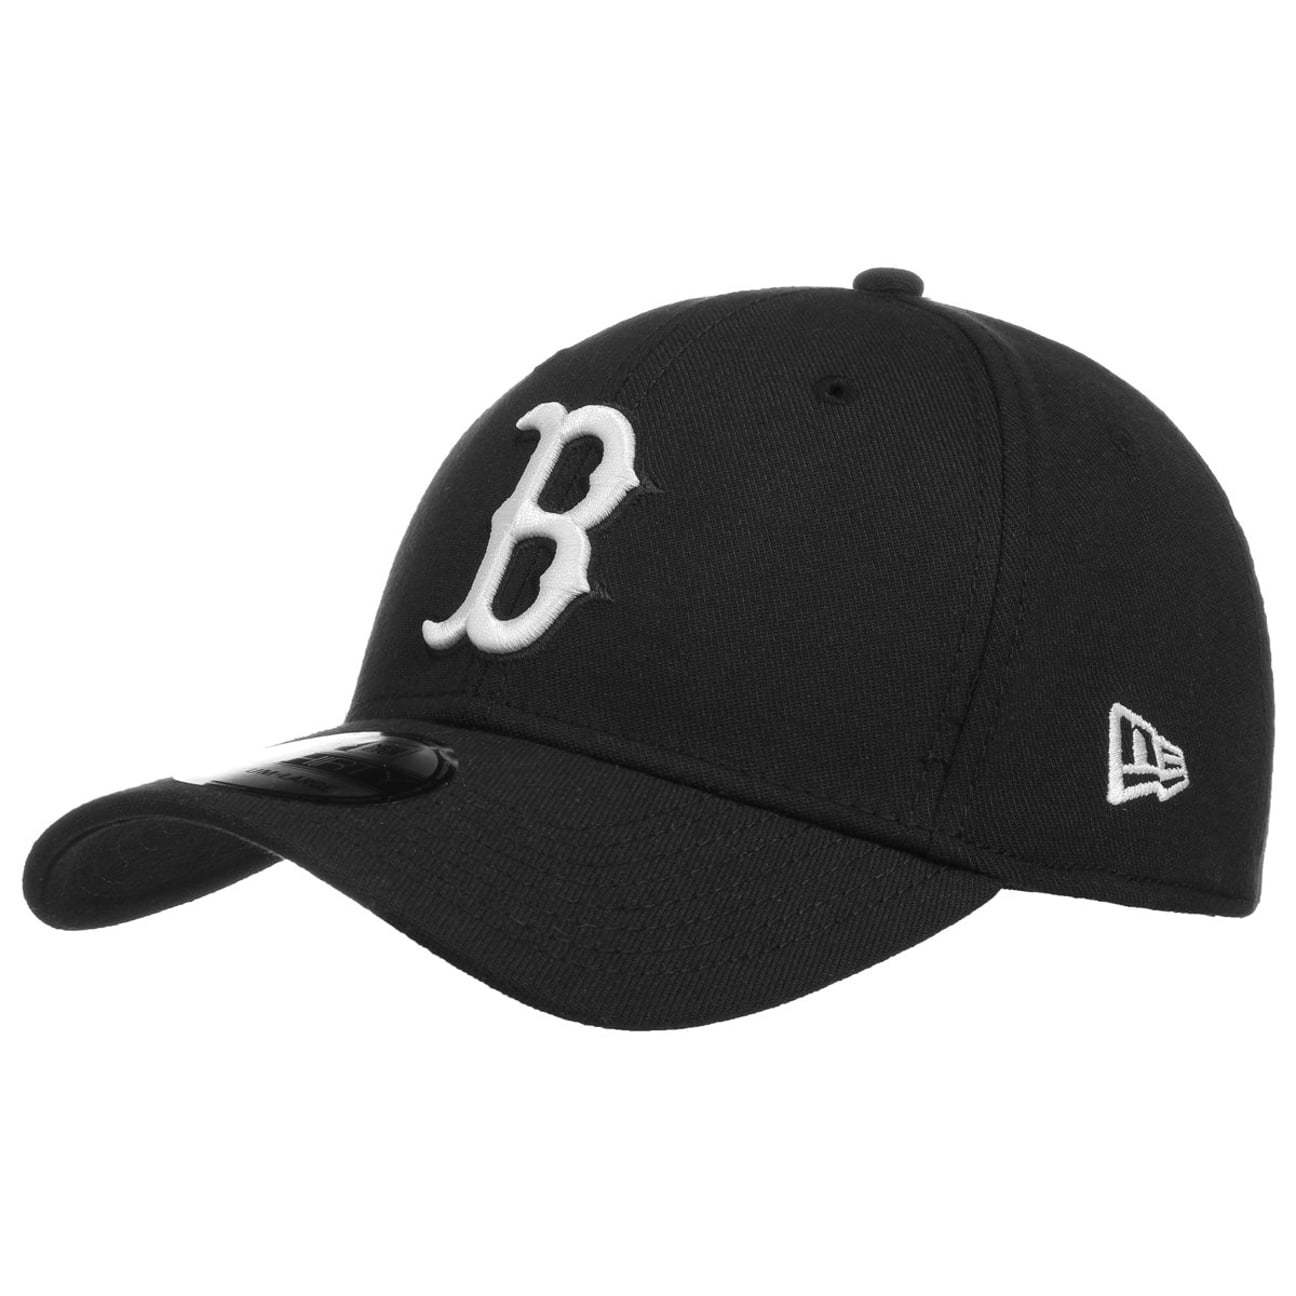 f55b4685 ... 39Thirty Boston Red Sox Basecap by New Era - black 5